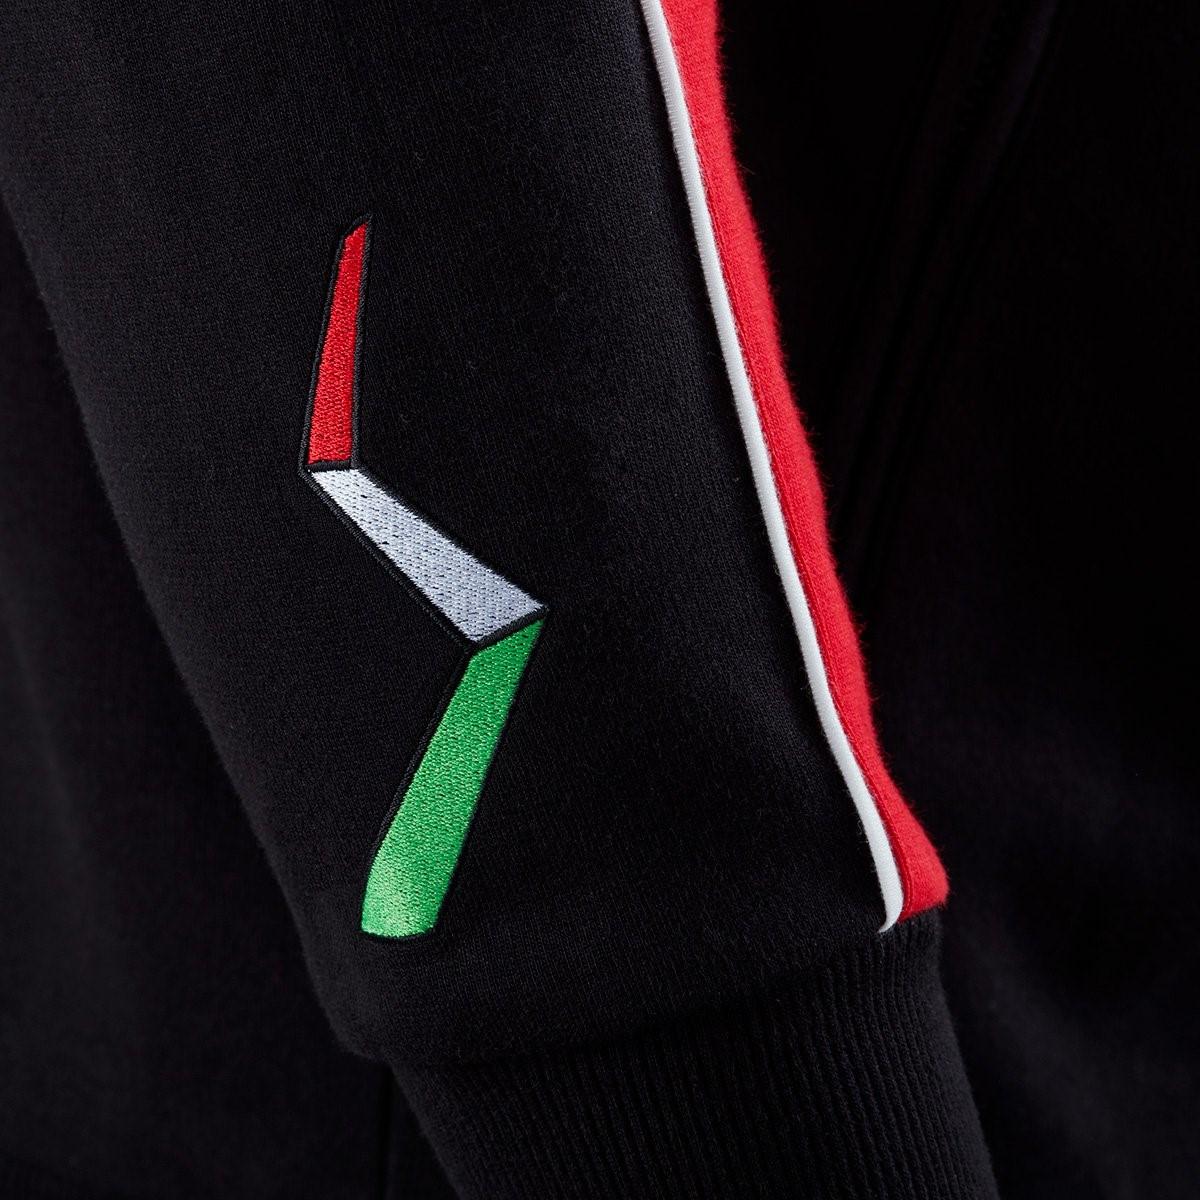 【DUCATI performance】Ducati Corse Speed 連帽運動衫 - 「Webike-摩托百貨」